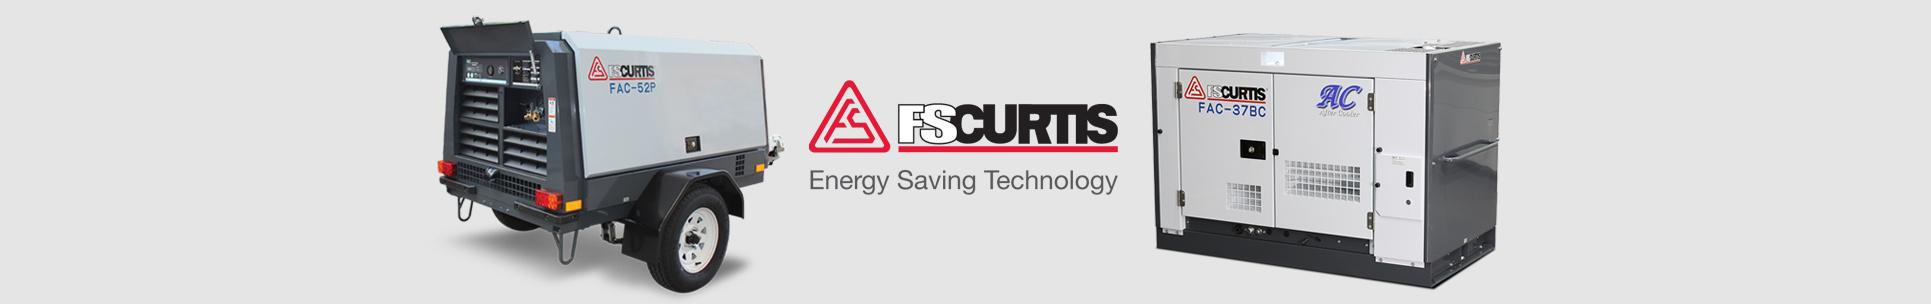 FSCurtis - Energy Saving Technology